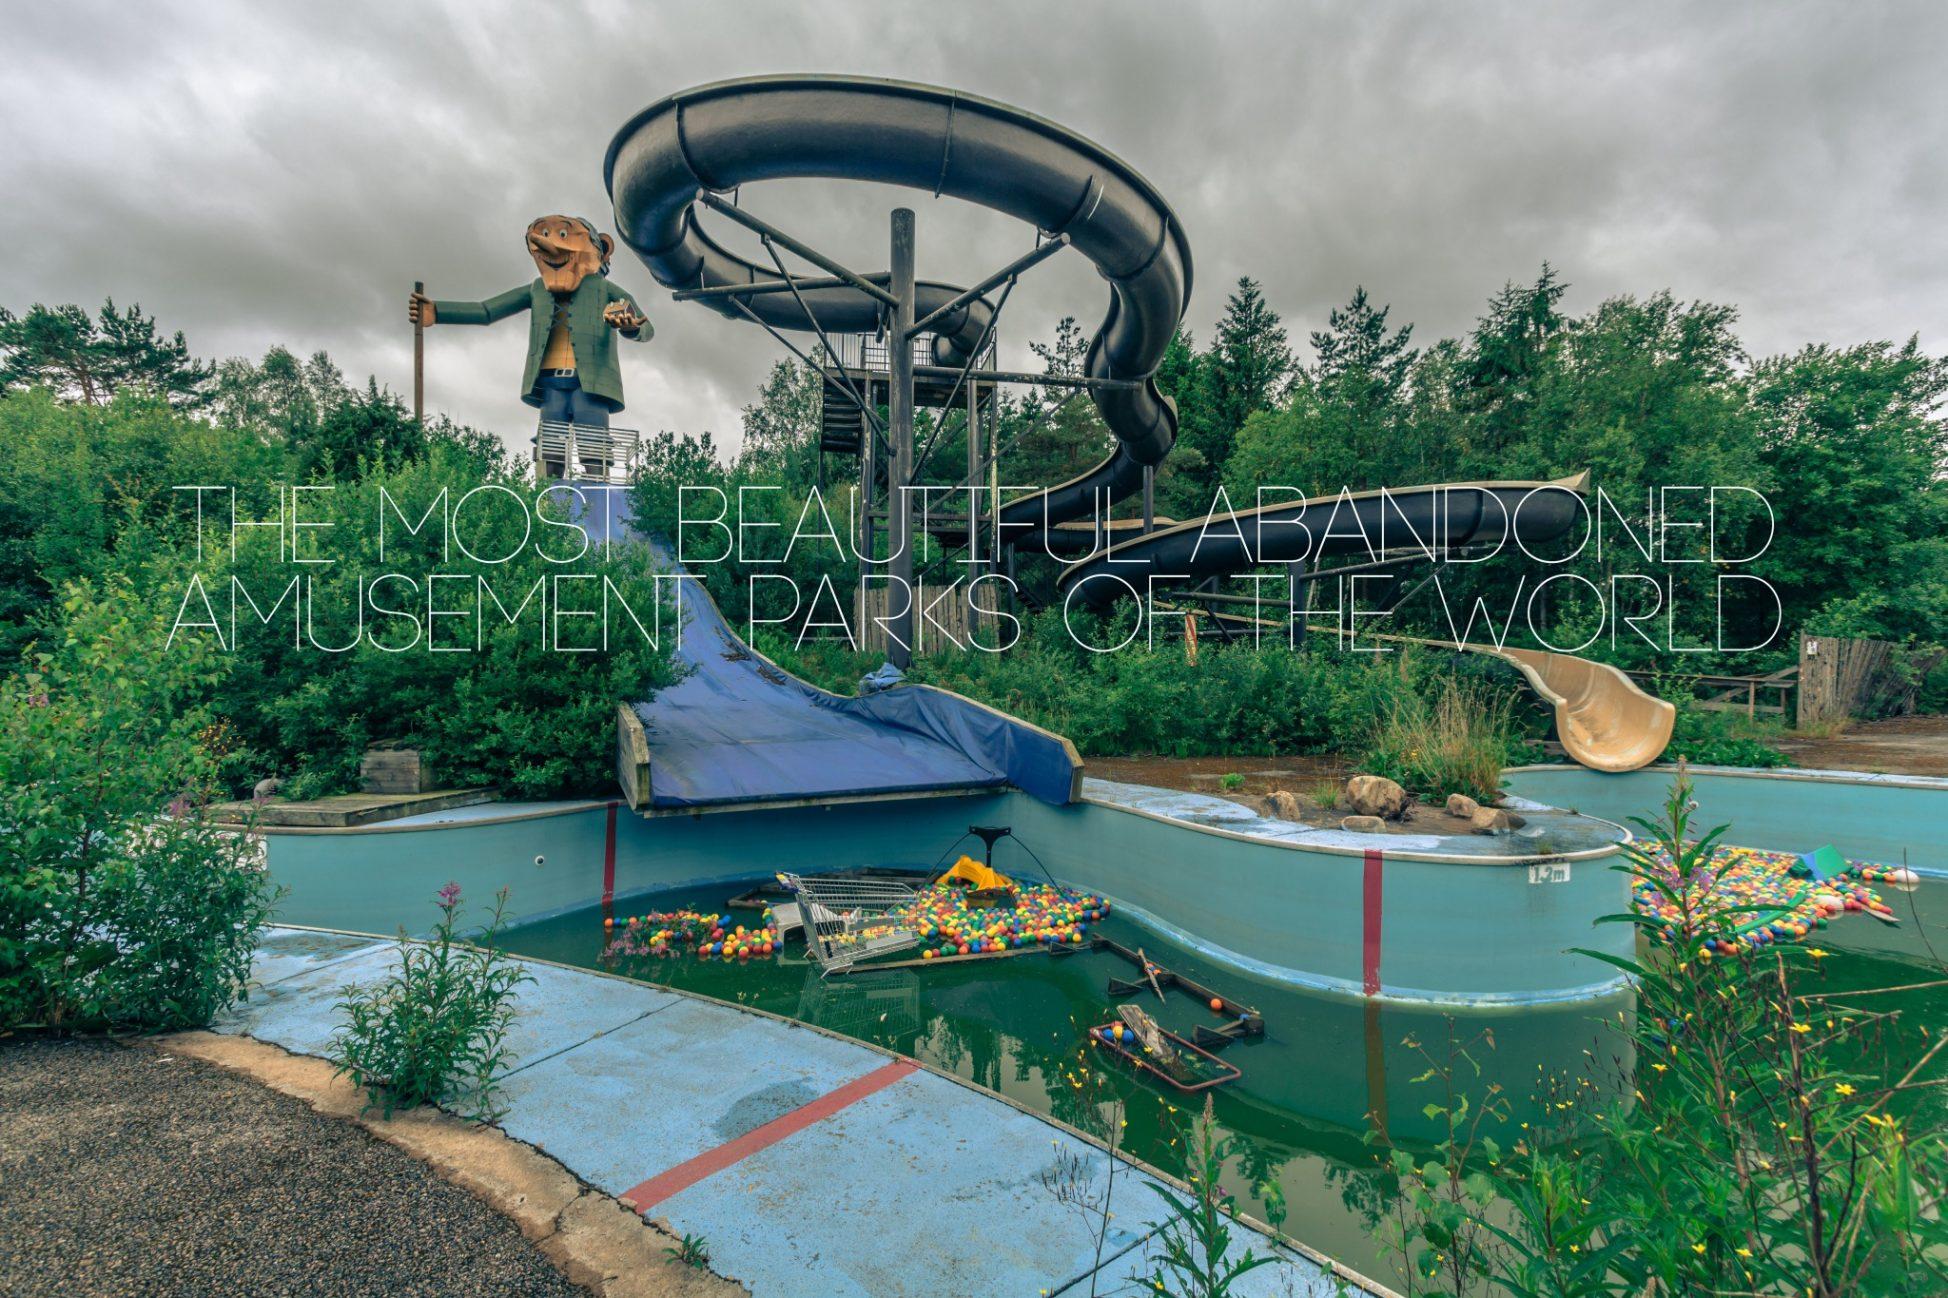 beautiful-abandoned-amusement-parks-of-the-world